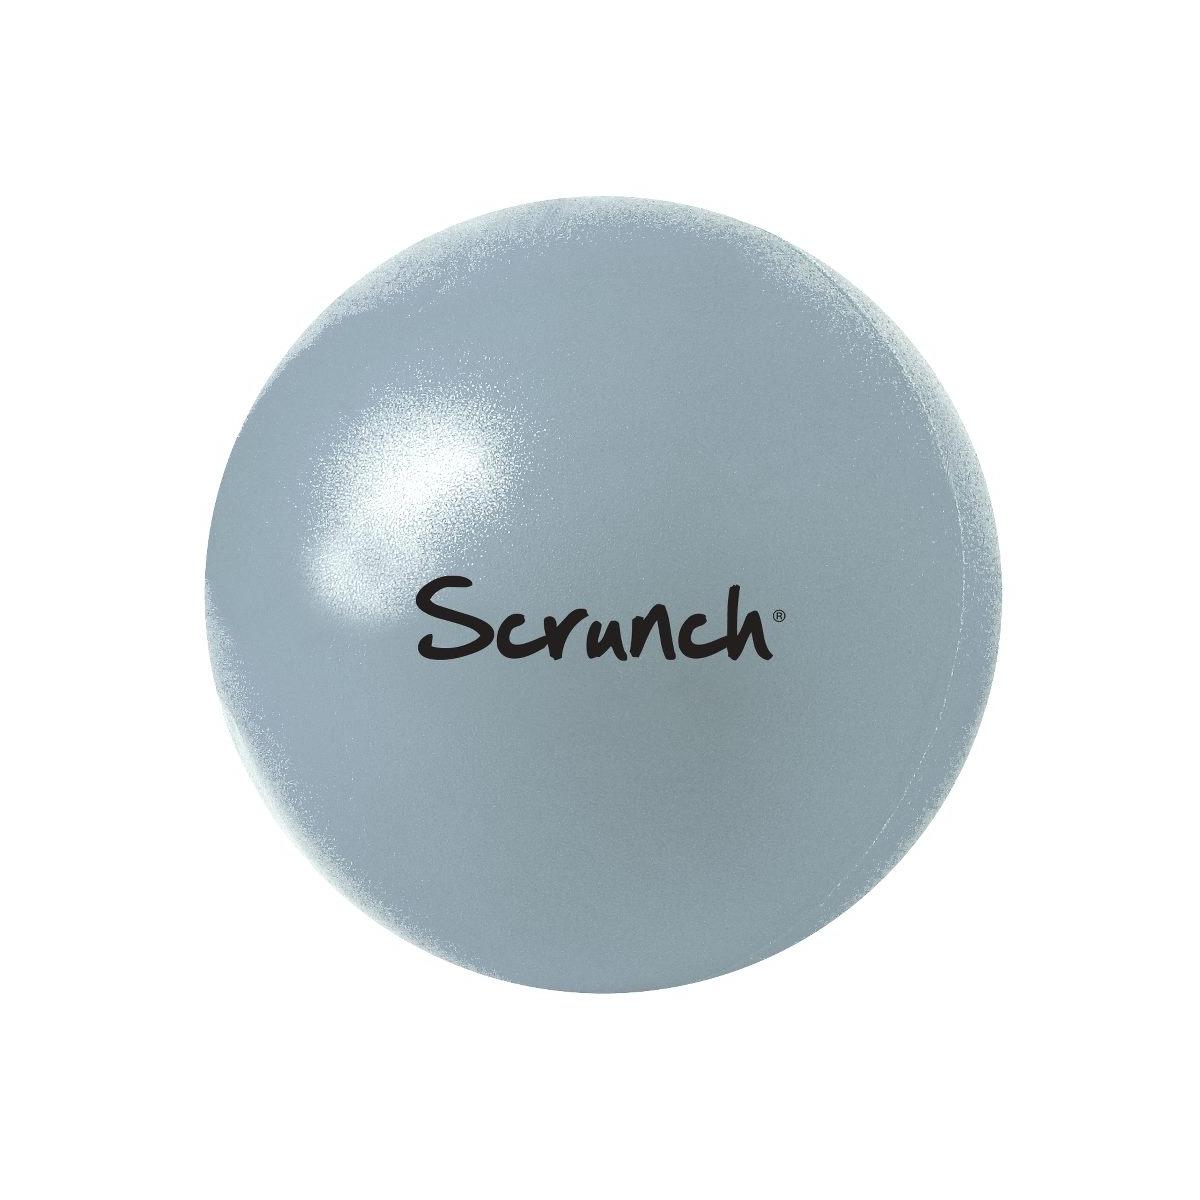 pilka-scrunch-blekitny